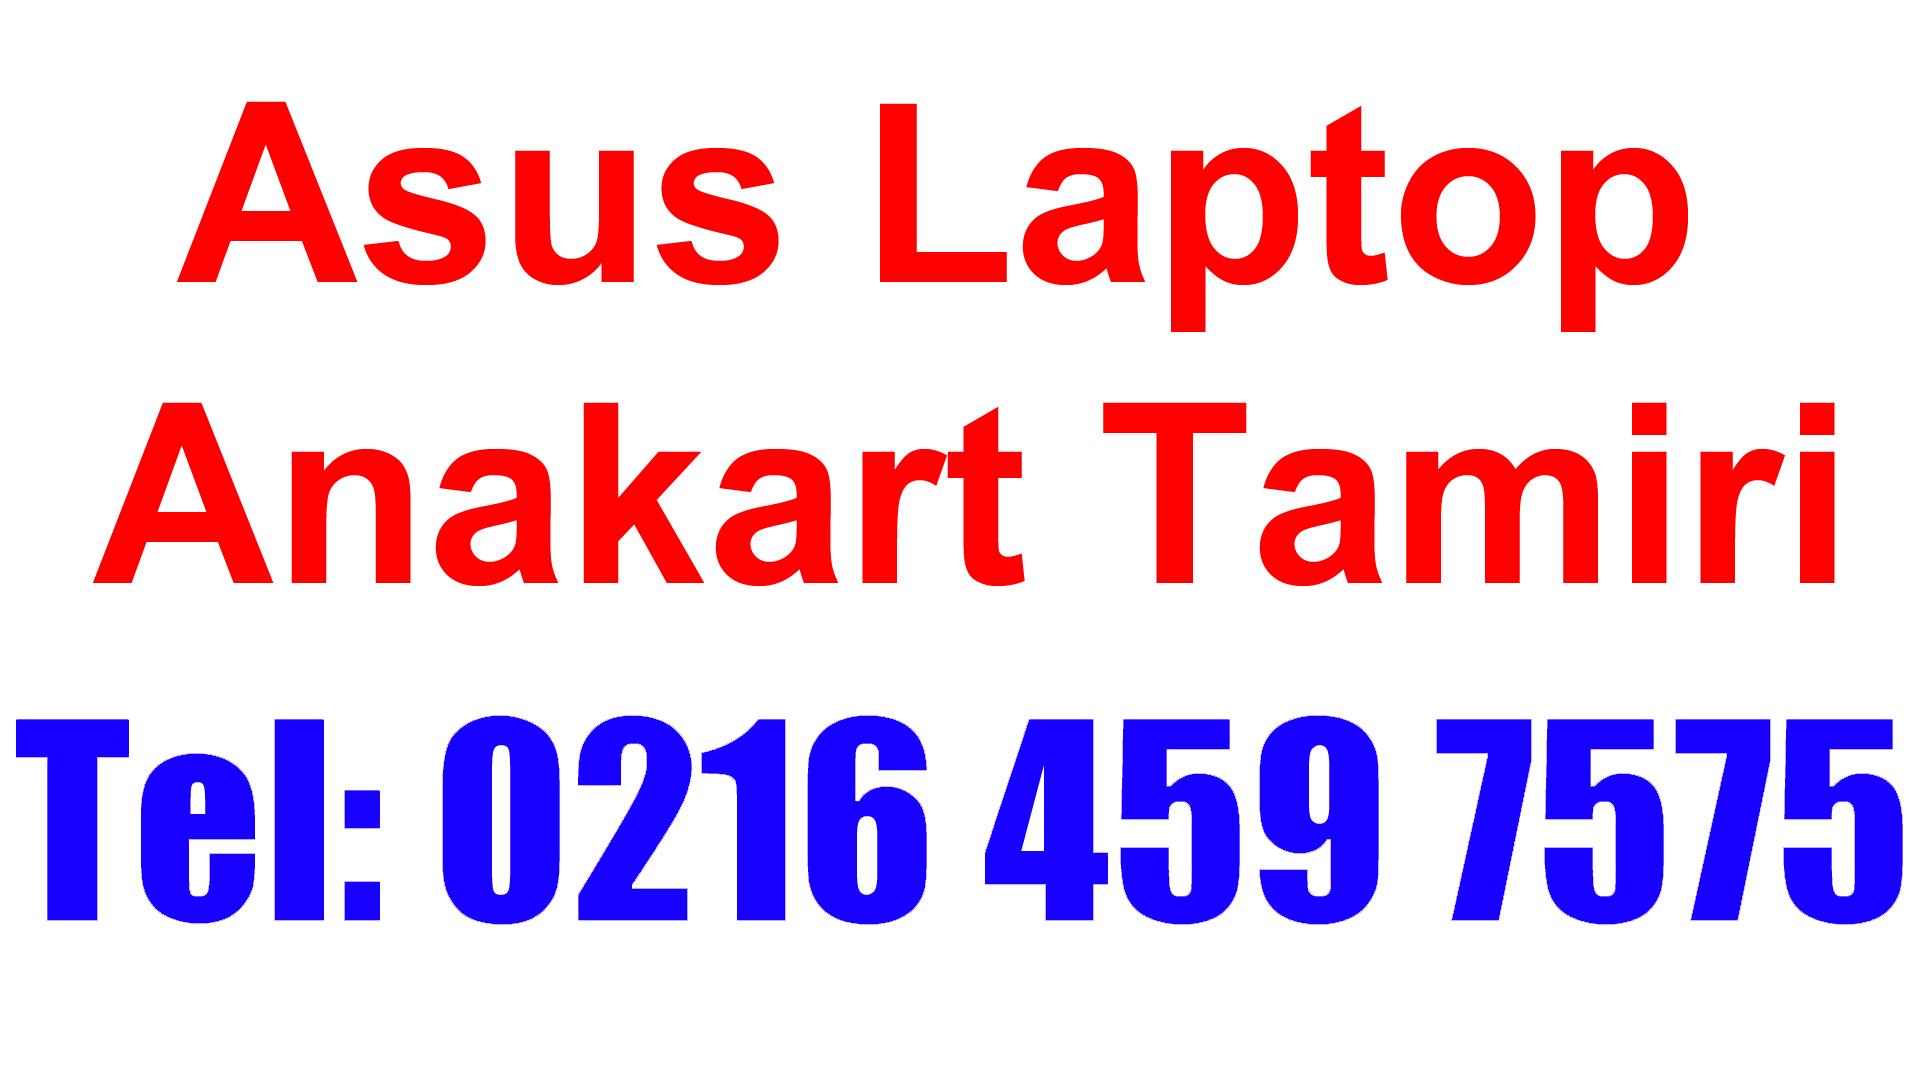 Asus Laptop Anakart Tamiri